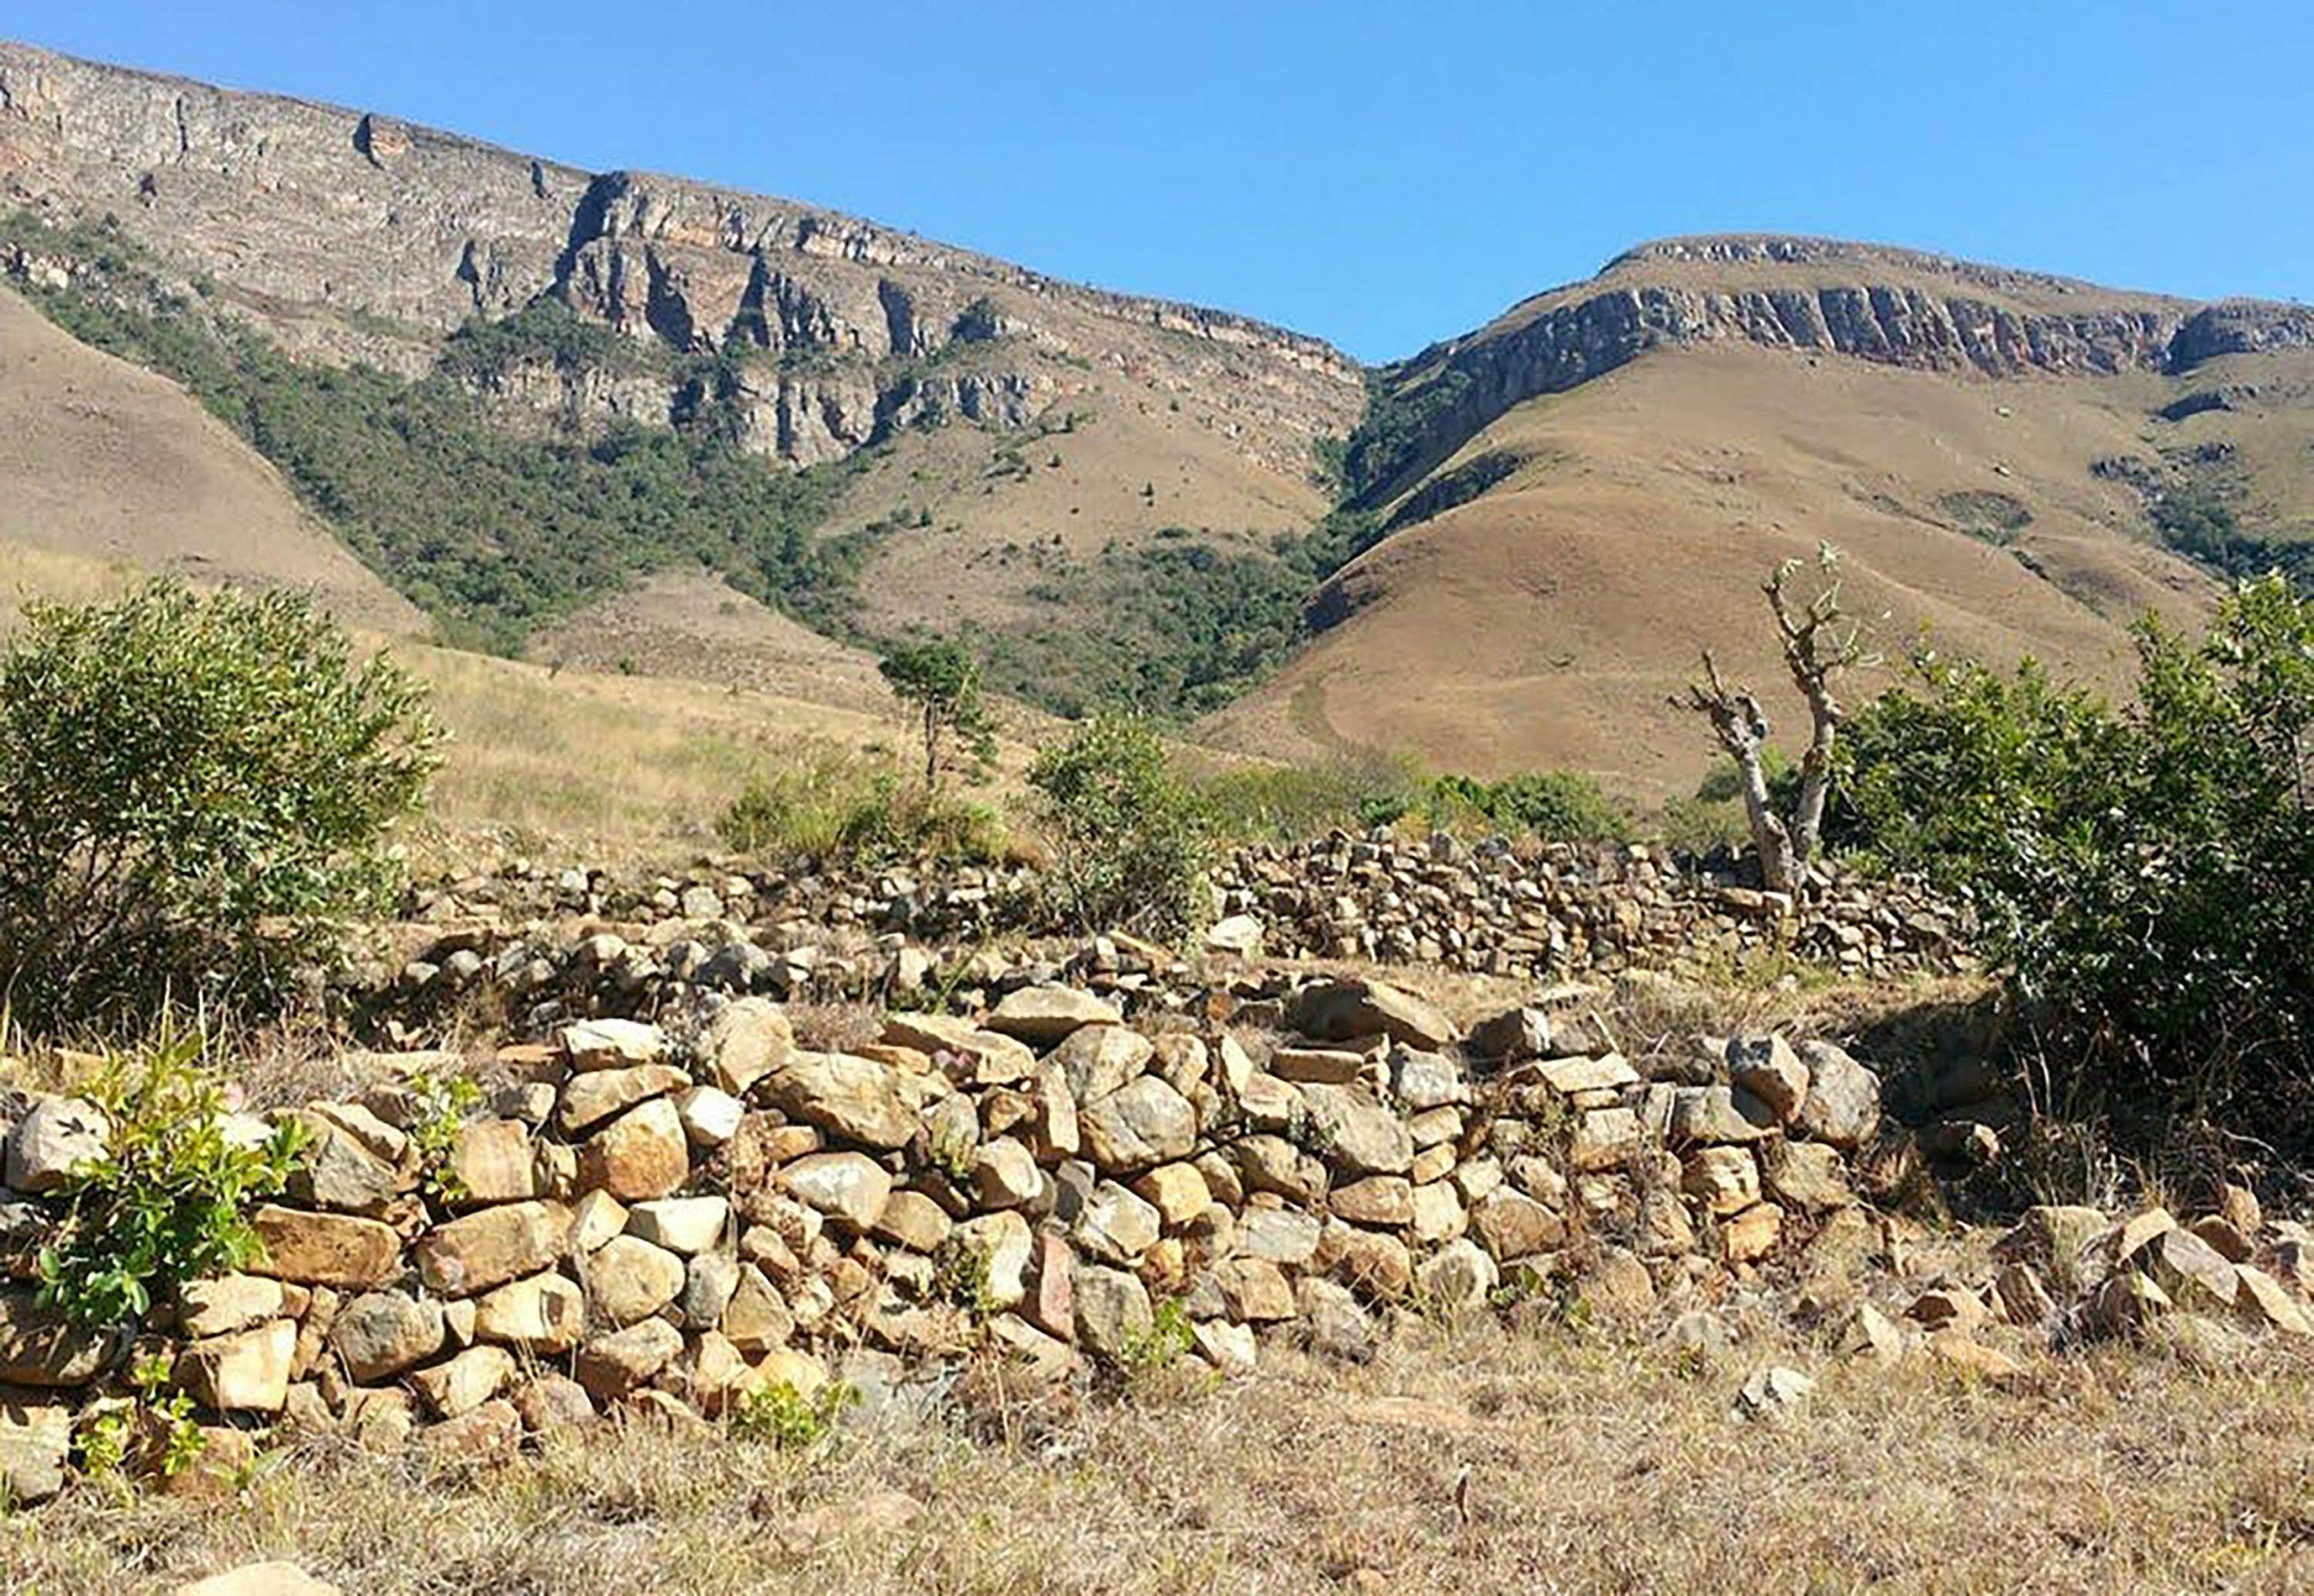 Undated: Bokoni terracing on Verlorenkloof farm on the Mpumalanga escarpment.